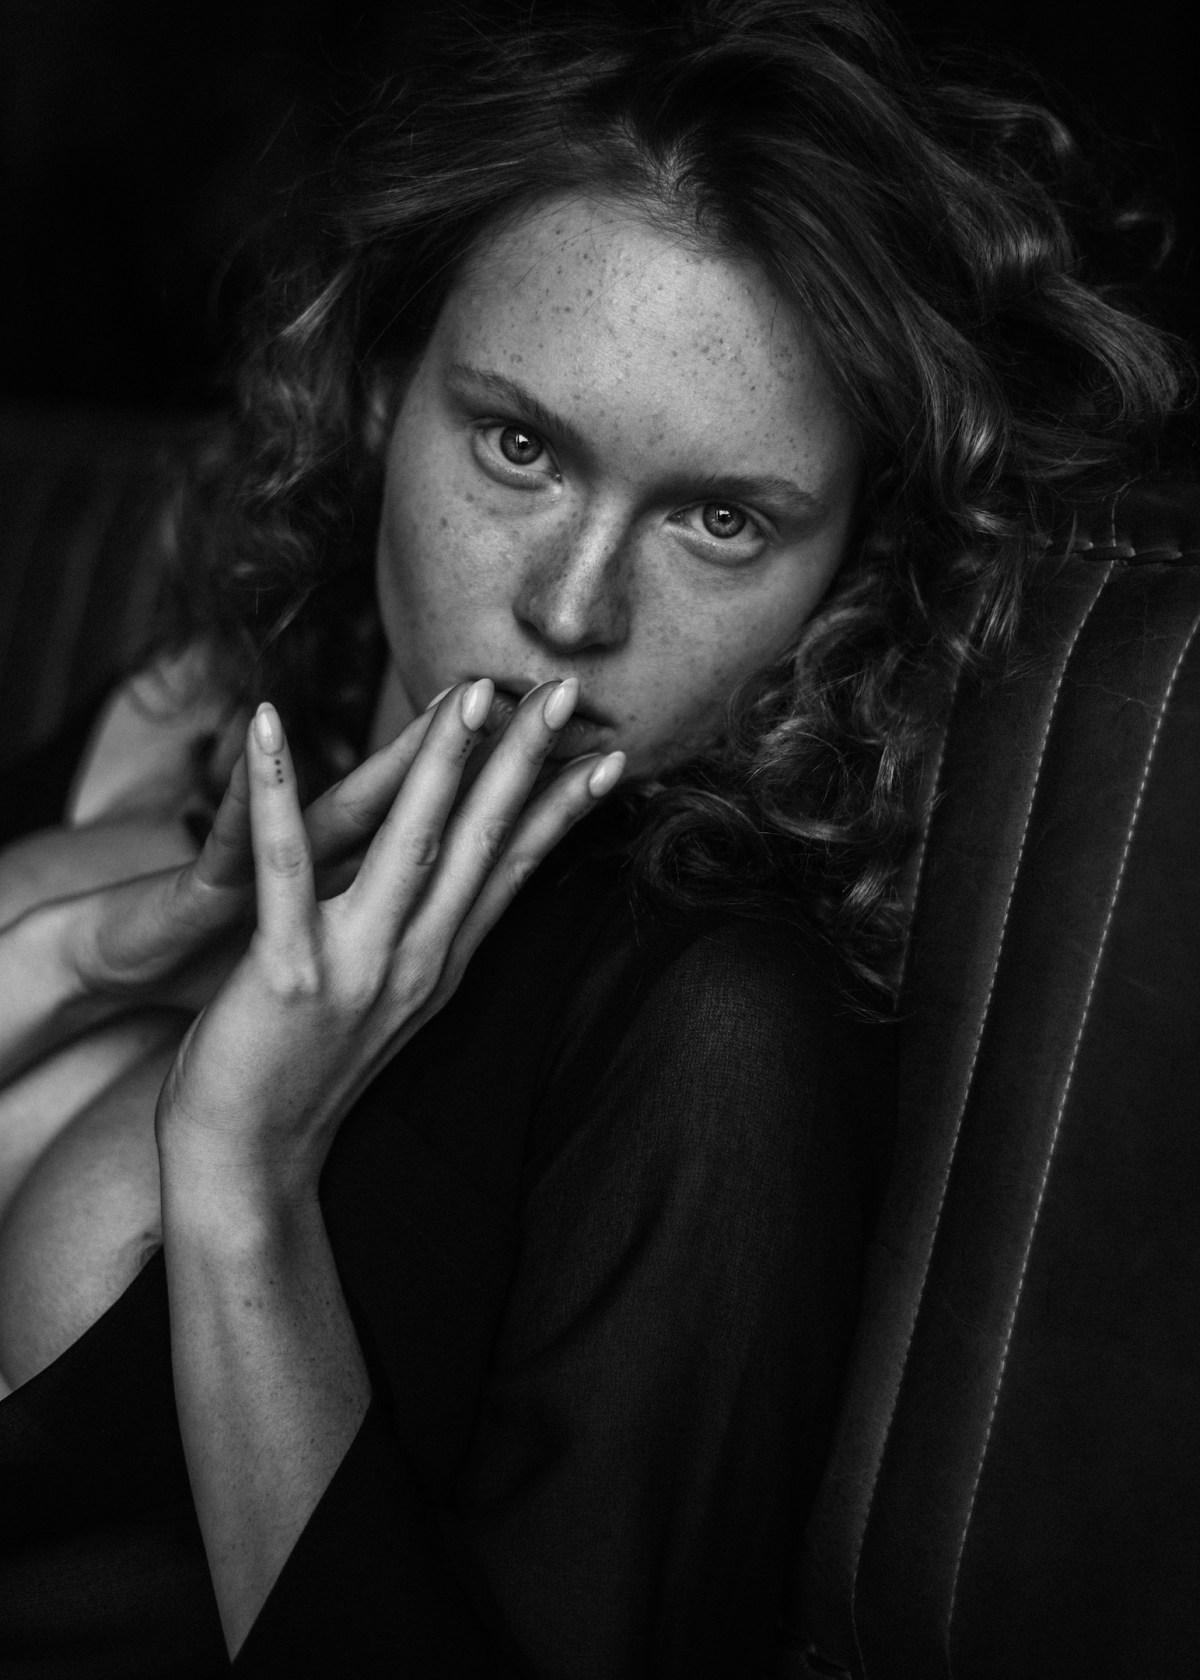 Arina Bikbulatova by Marina Scheglova